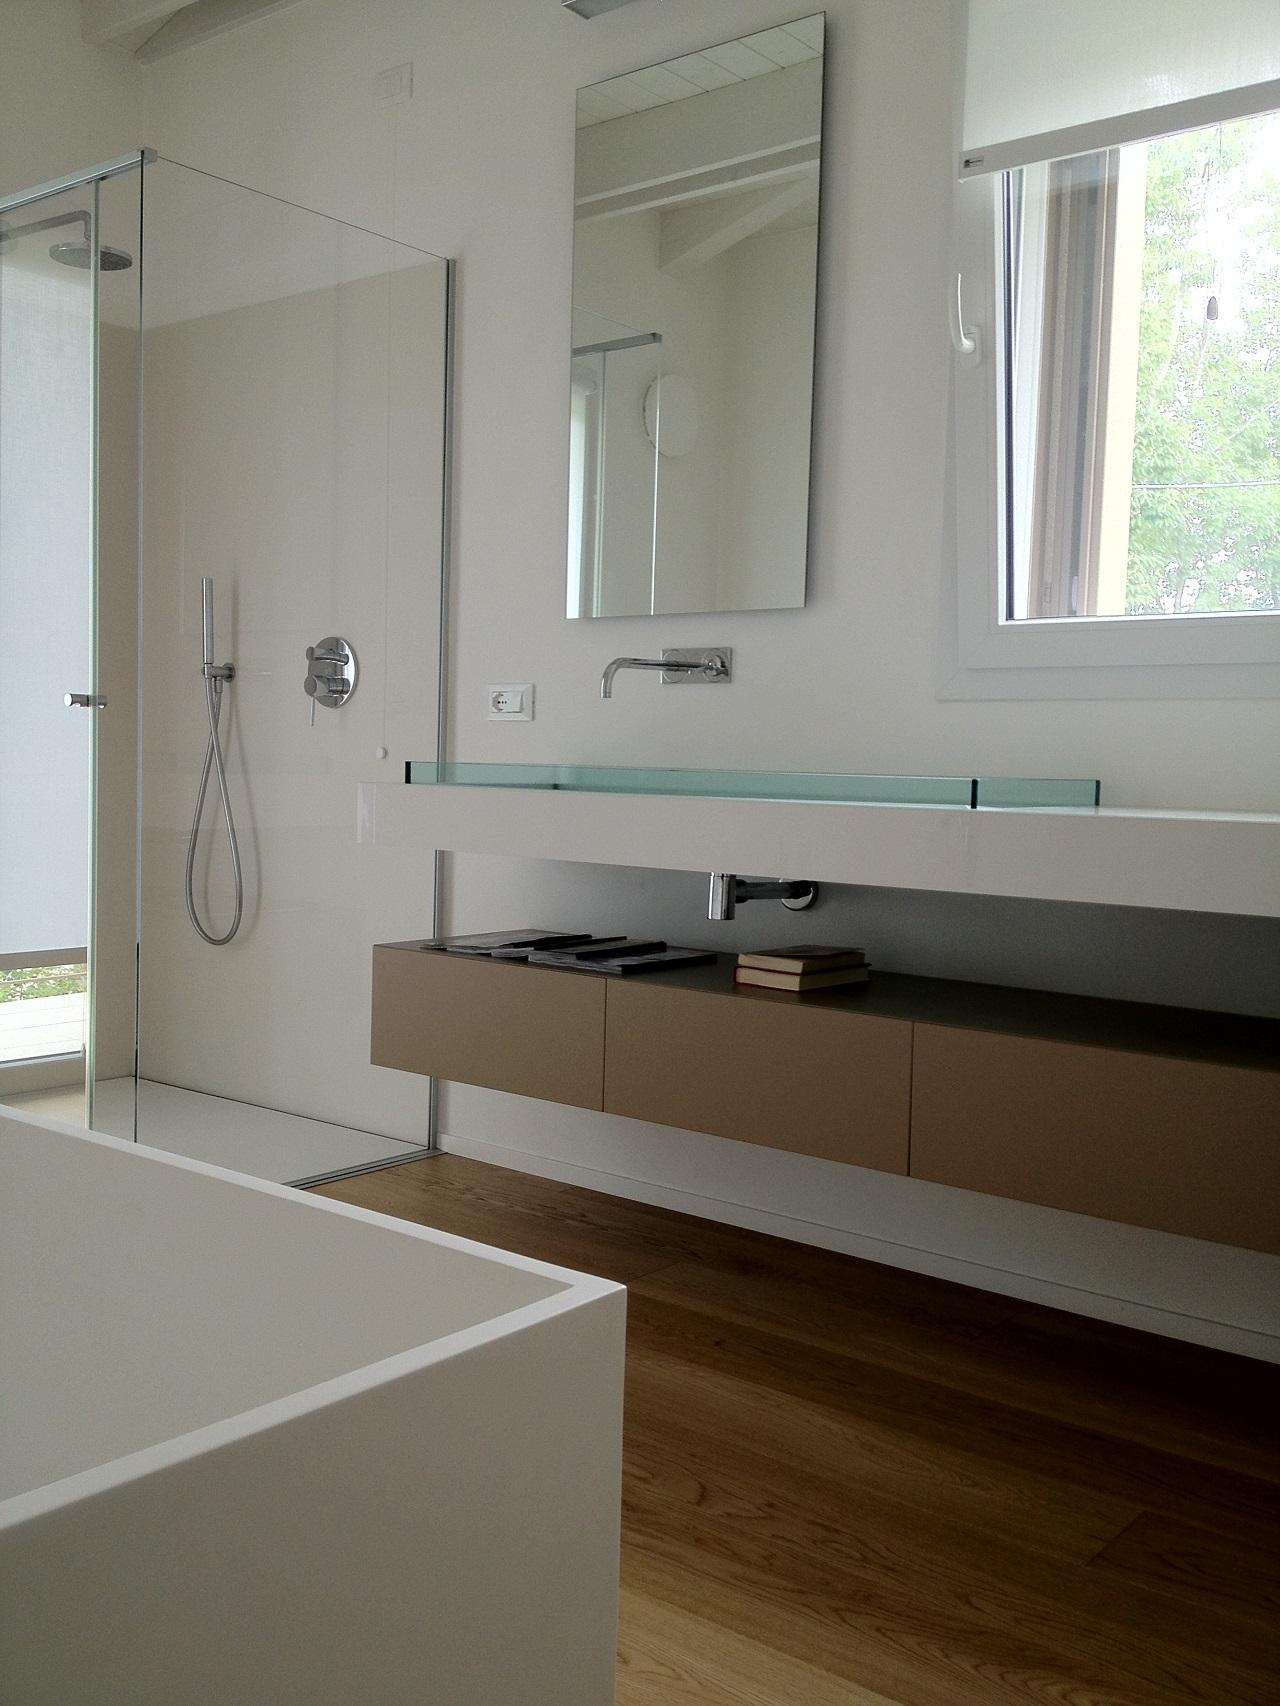 Accessori Bagno Agape : Agape accessori bagno good cheap design bathrooms with